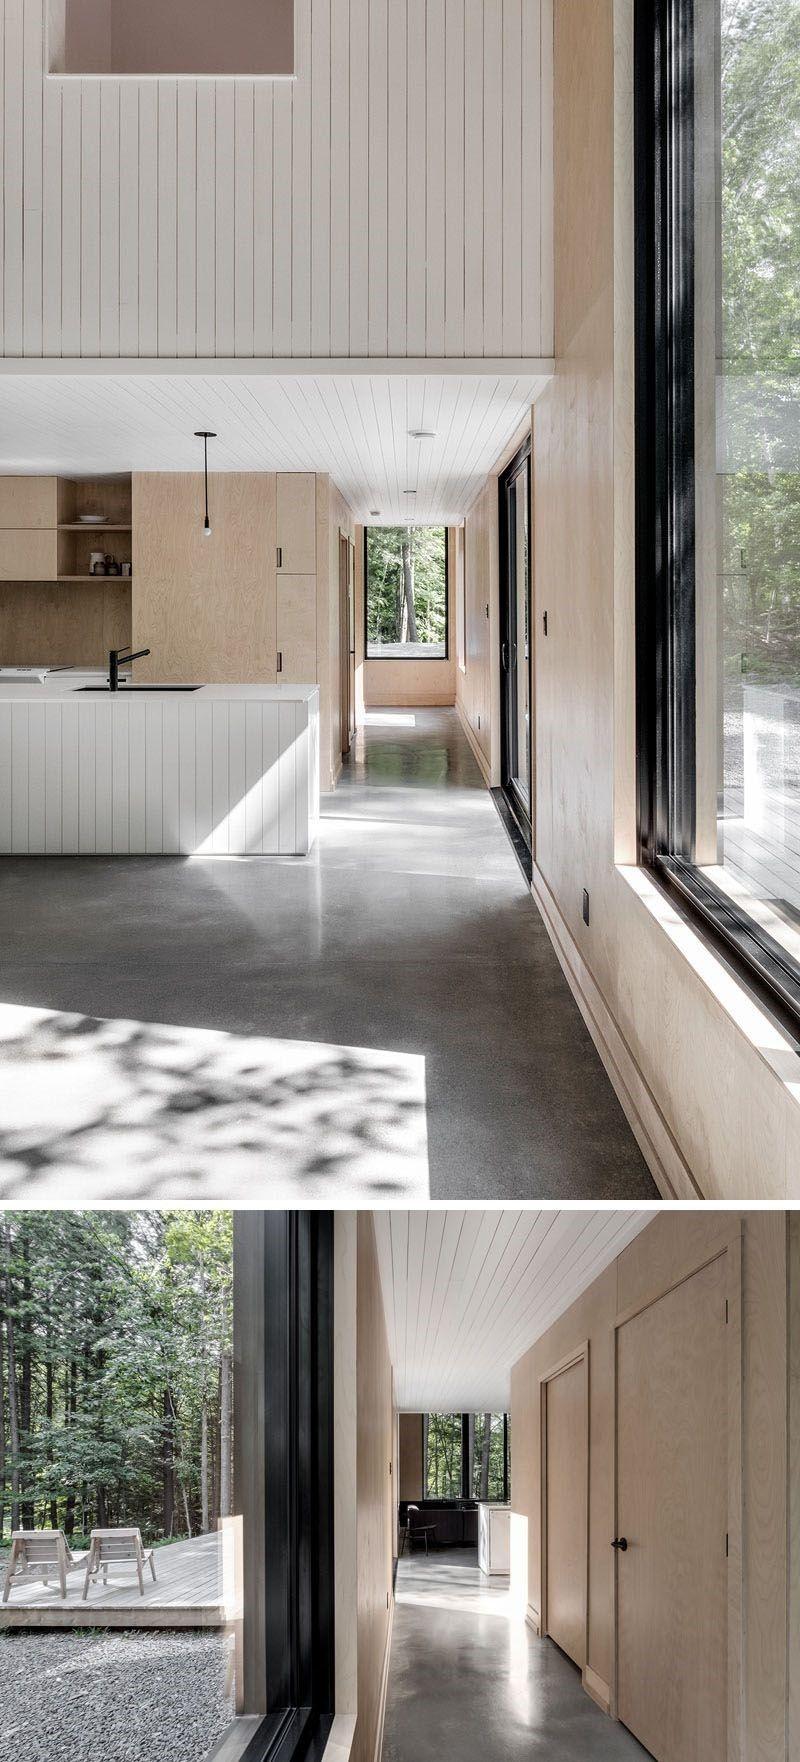 Superb interior design inspiration interiorideas homedesign also rh pinterest